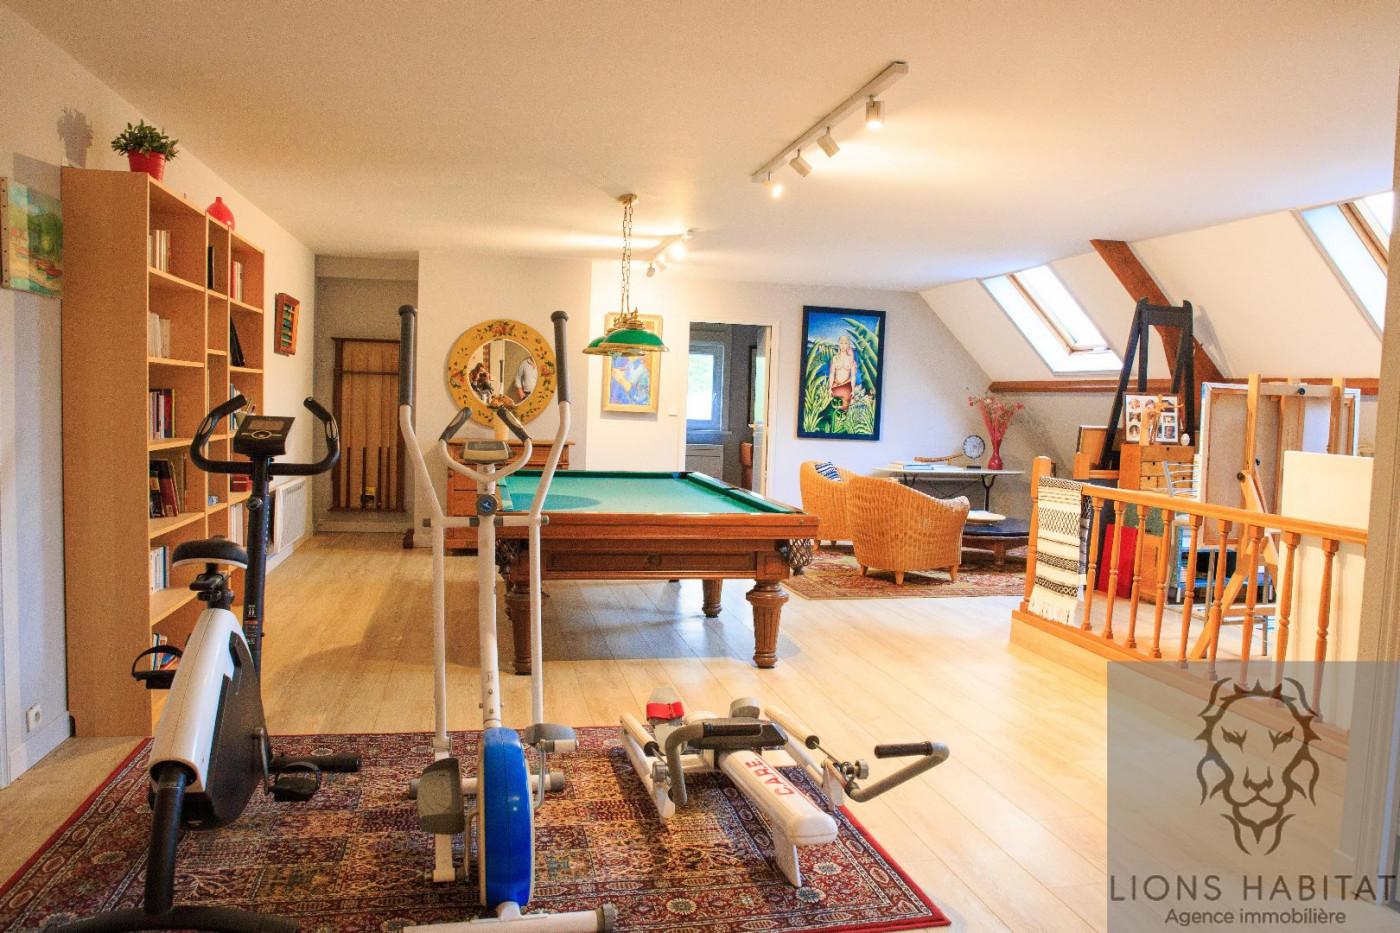 A vendre Aubers 5901495 Lions habitat